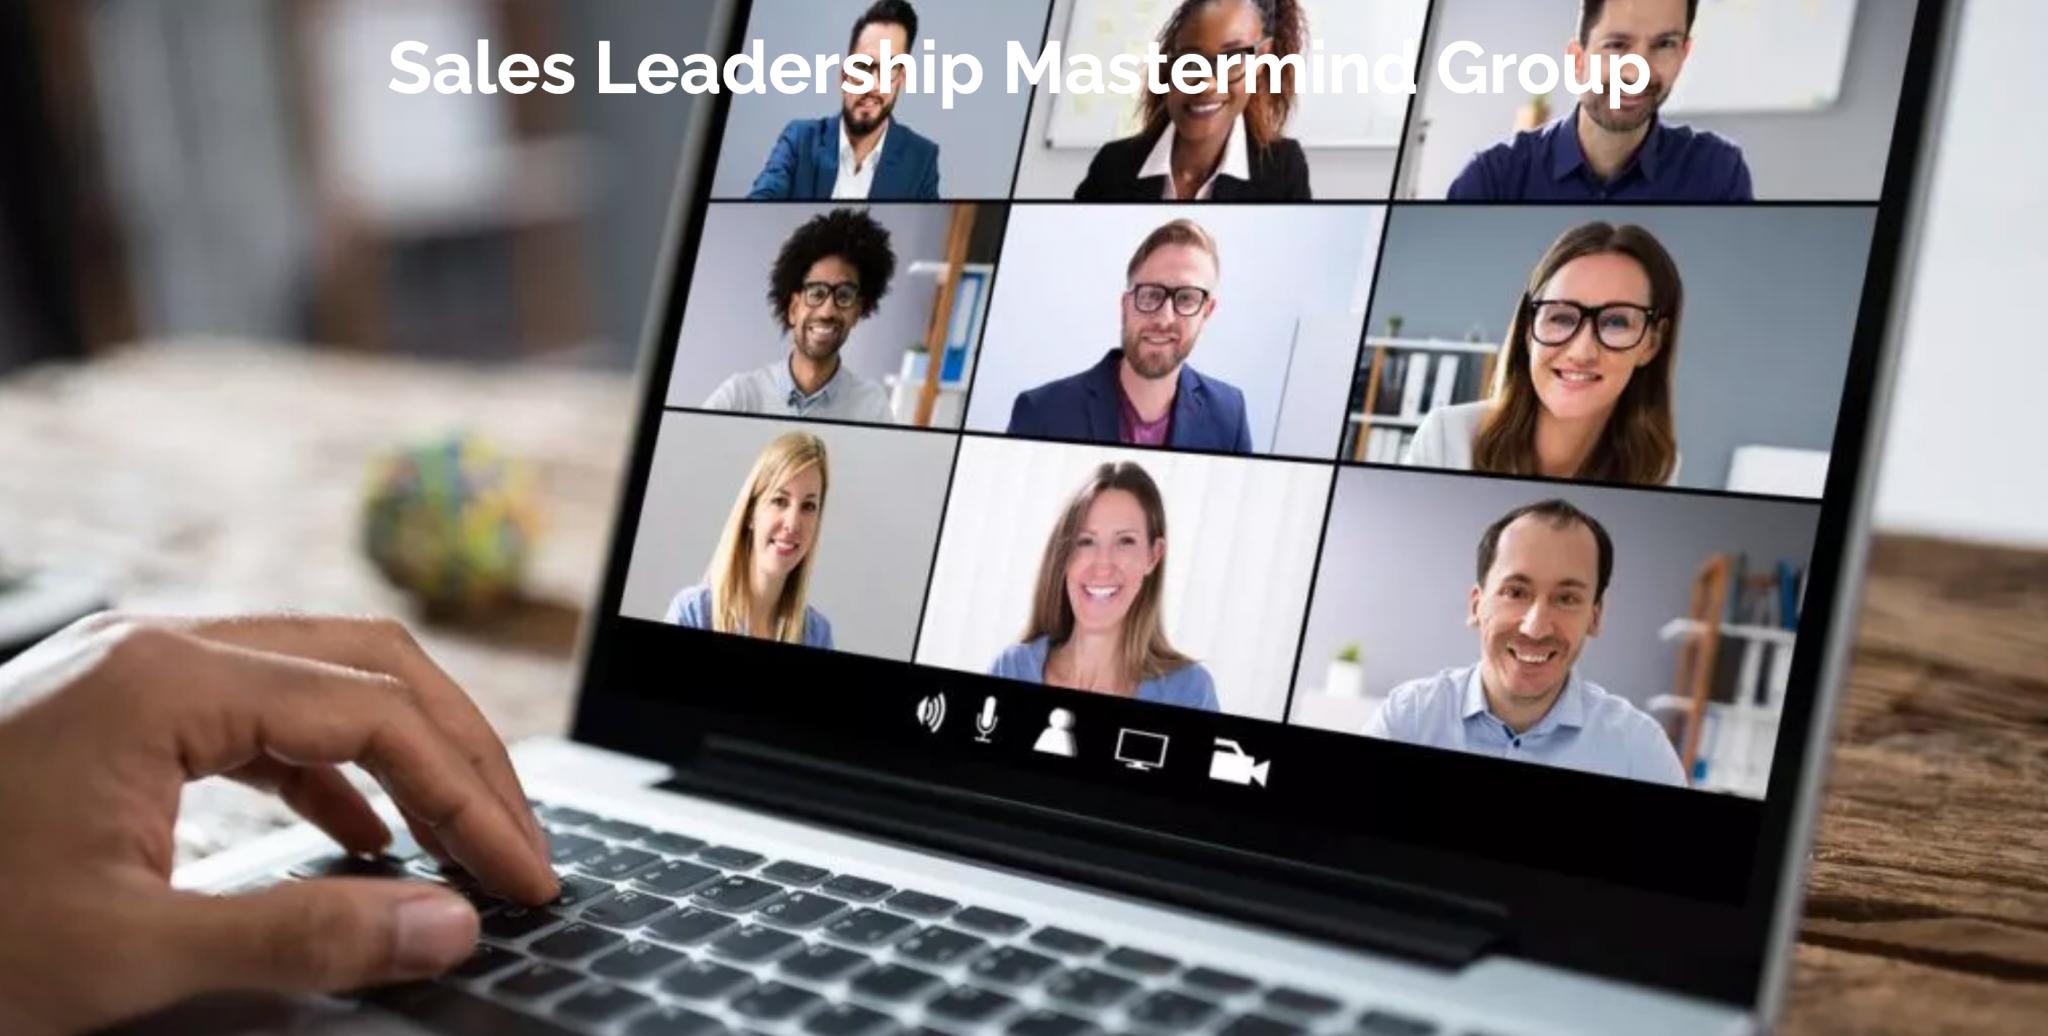 sales leadership mastermind group